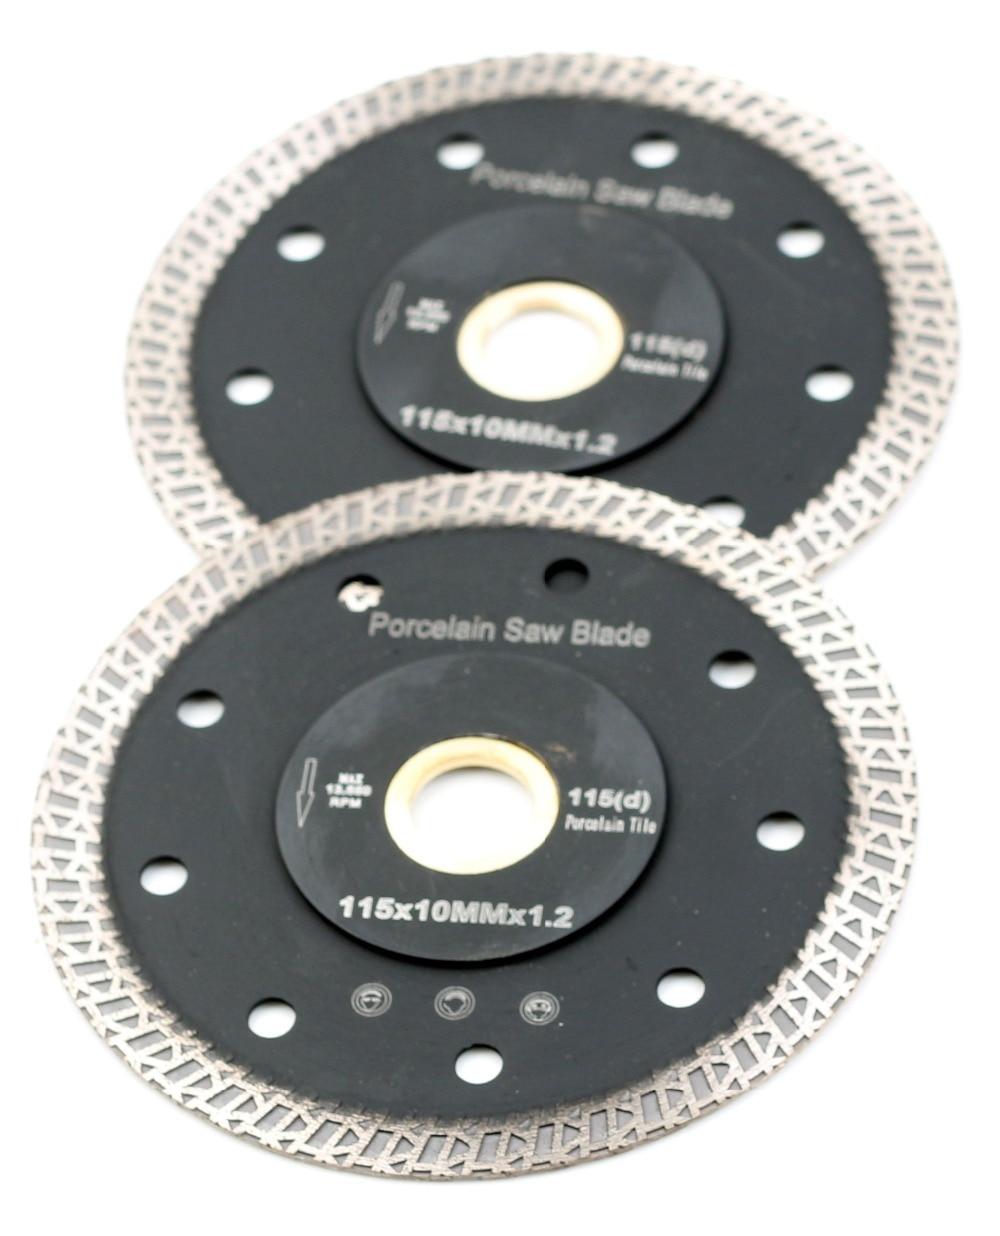 DC-SRSB02 D115mm Super Thin 4.5 Inch Diamond Porcelain Cutting Blade For Porcelain Tile Cutting